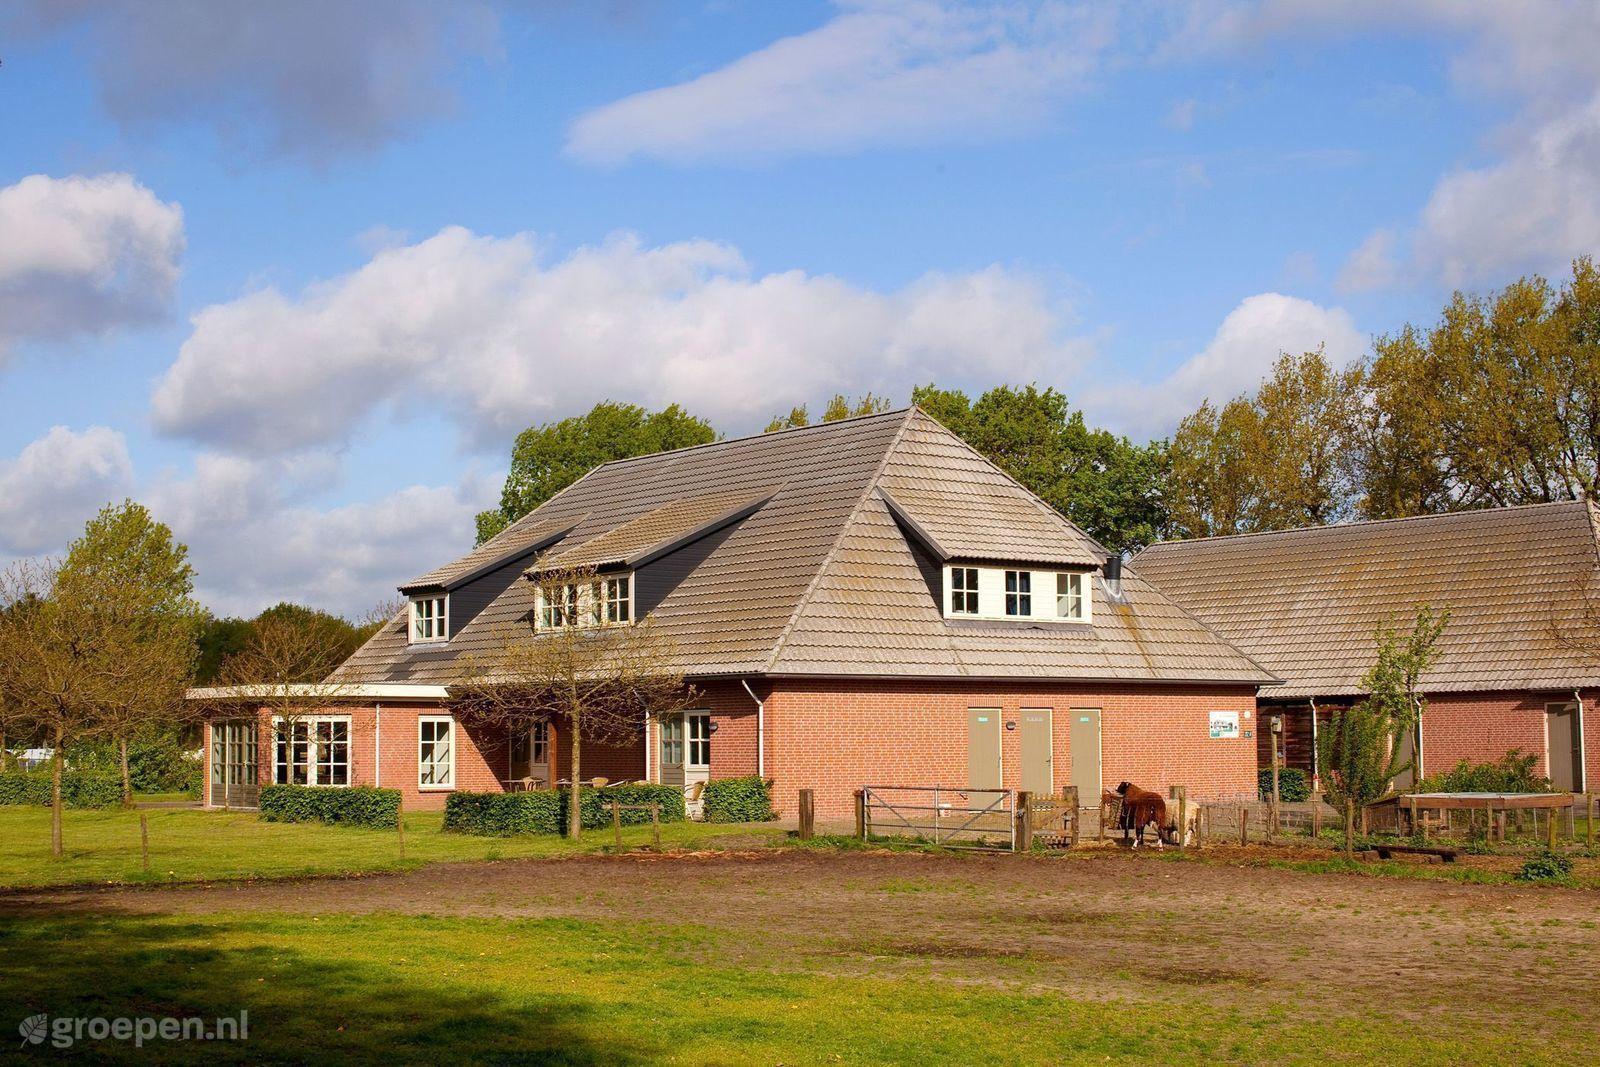 Group accommodation Drunen